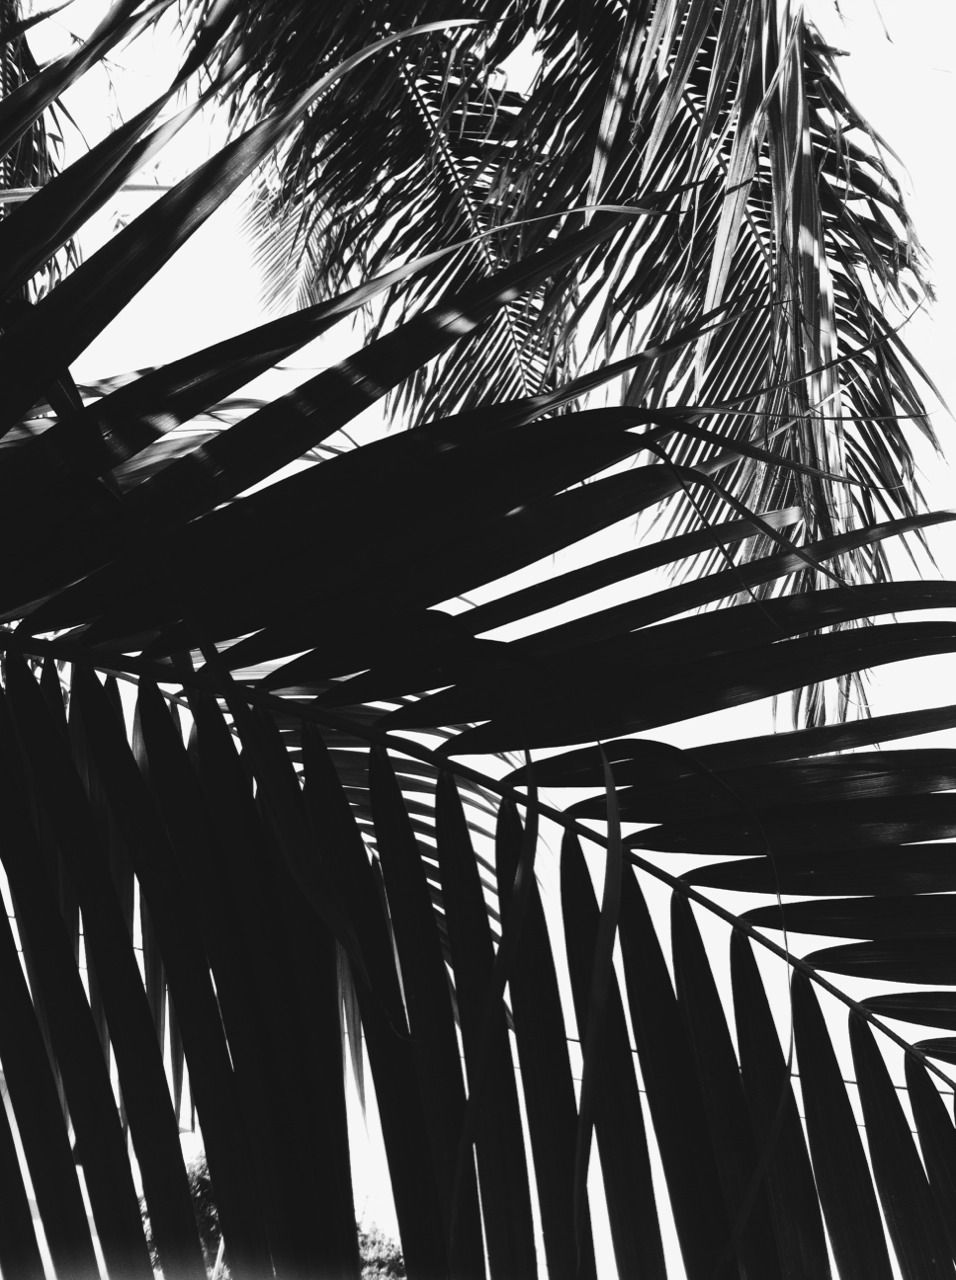 Black n white black and white leaves black and